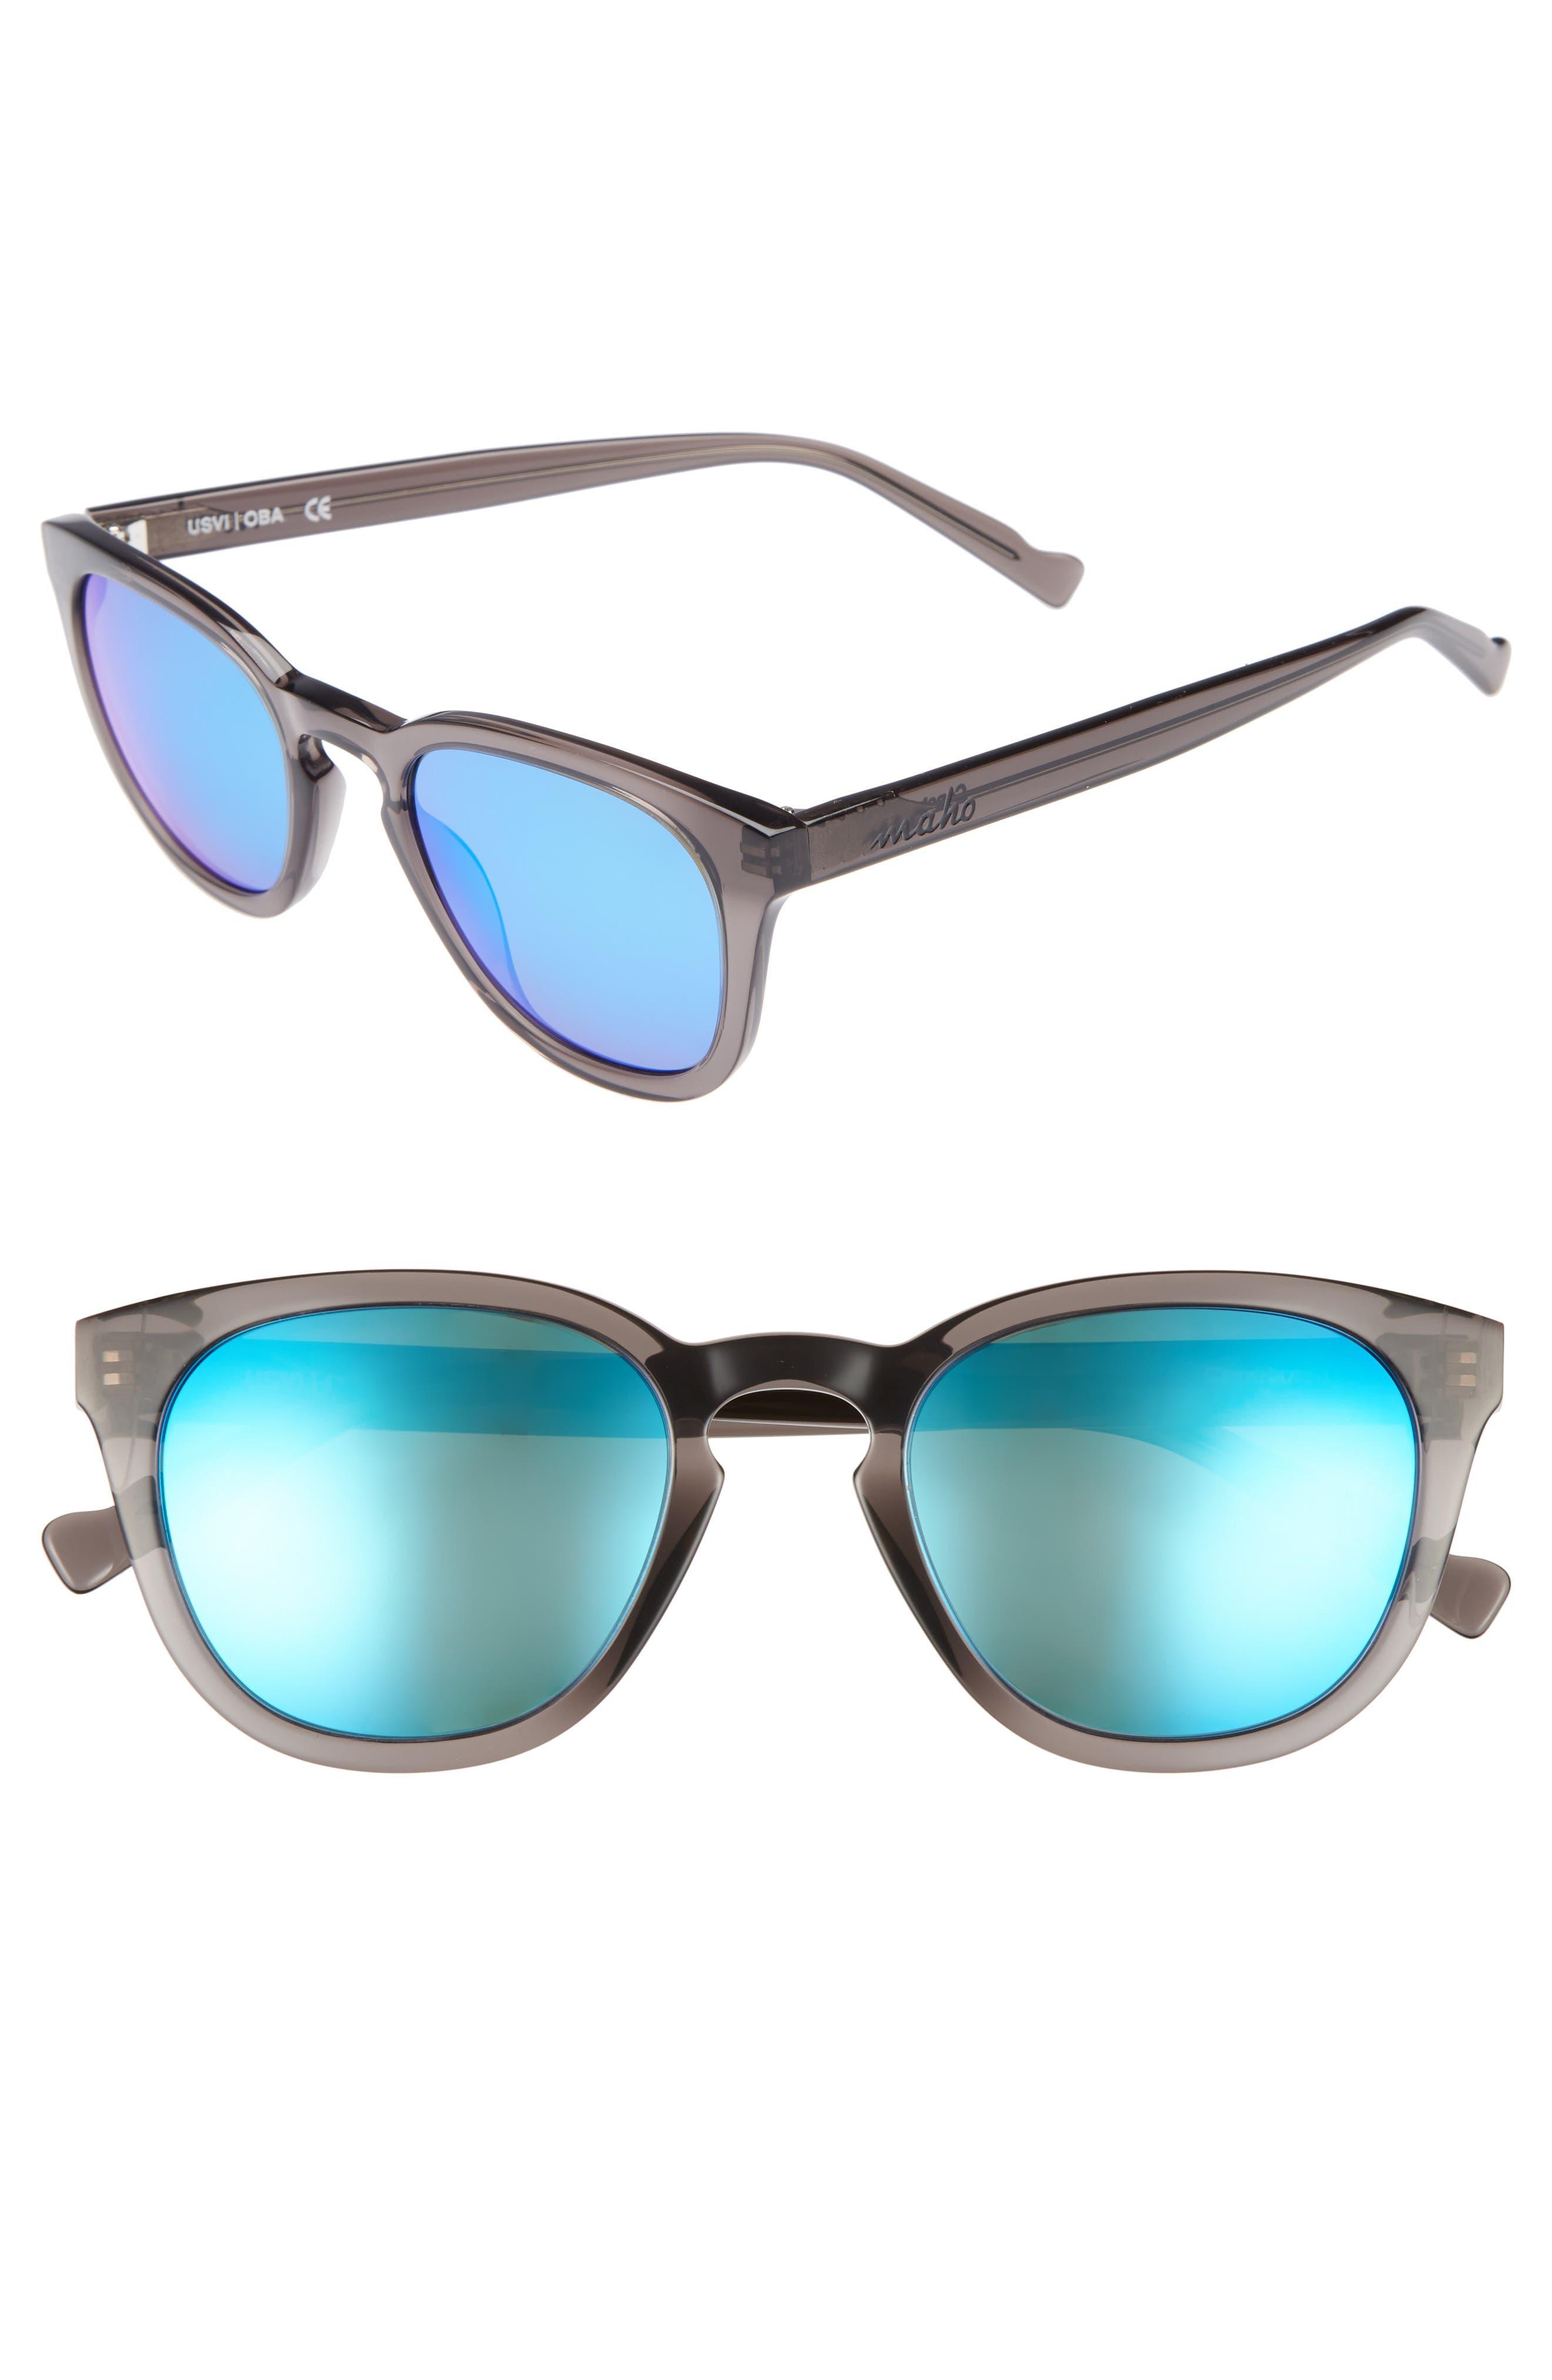 MAHO, Capetown 50mm Polarized Round Sunglasses, Main thumbnail 1, color, SLATE